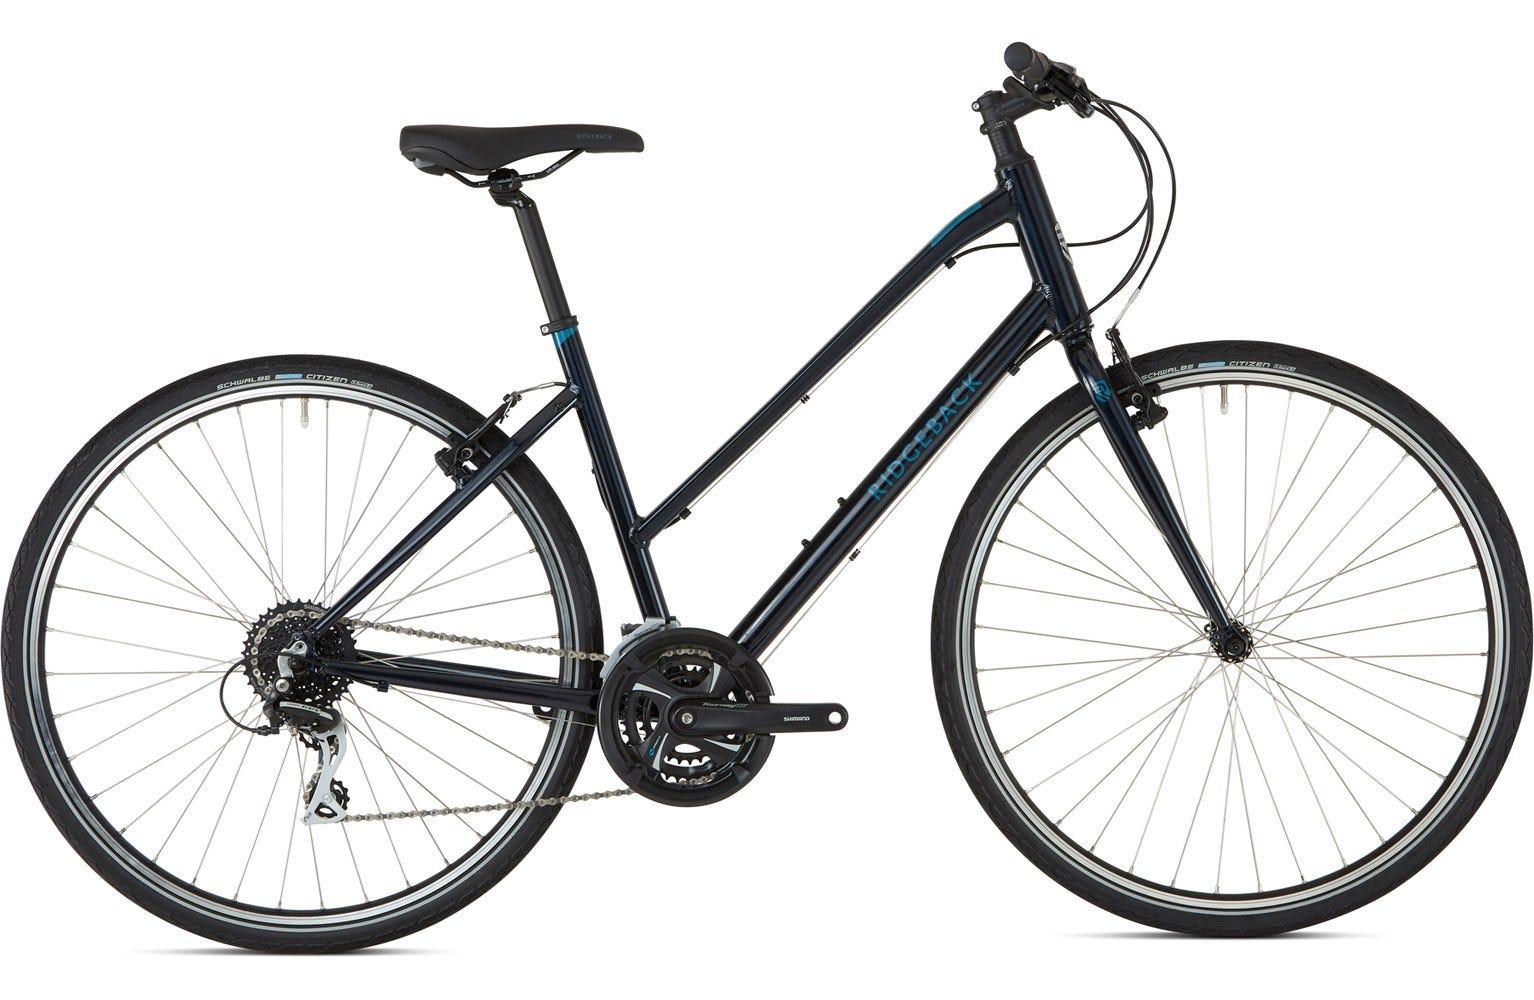 Ridgeback 2020 Velocity Open Frame LG bike sample (unused)